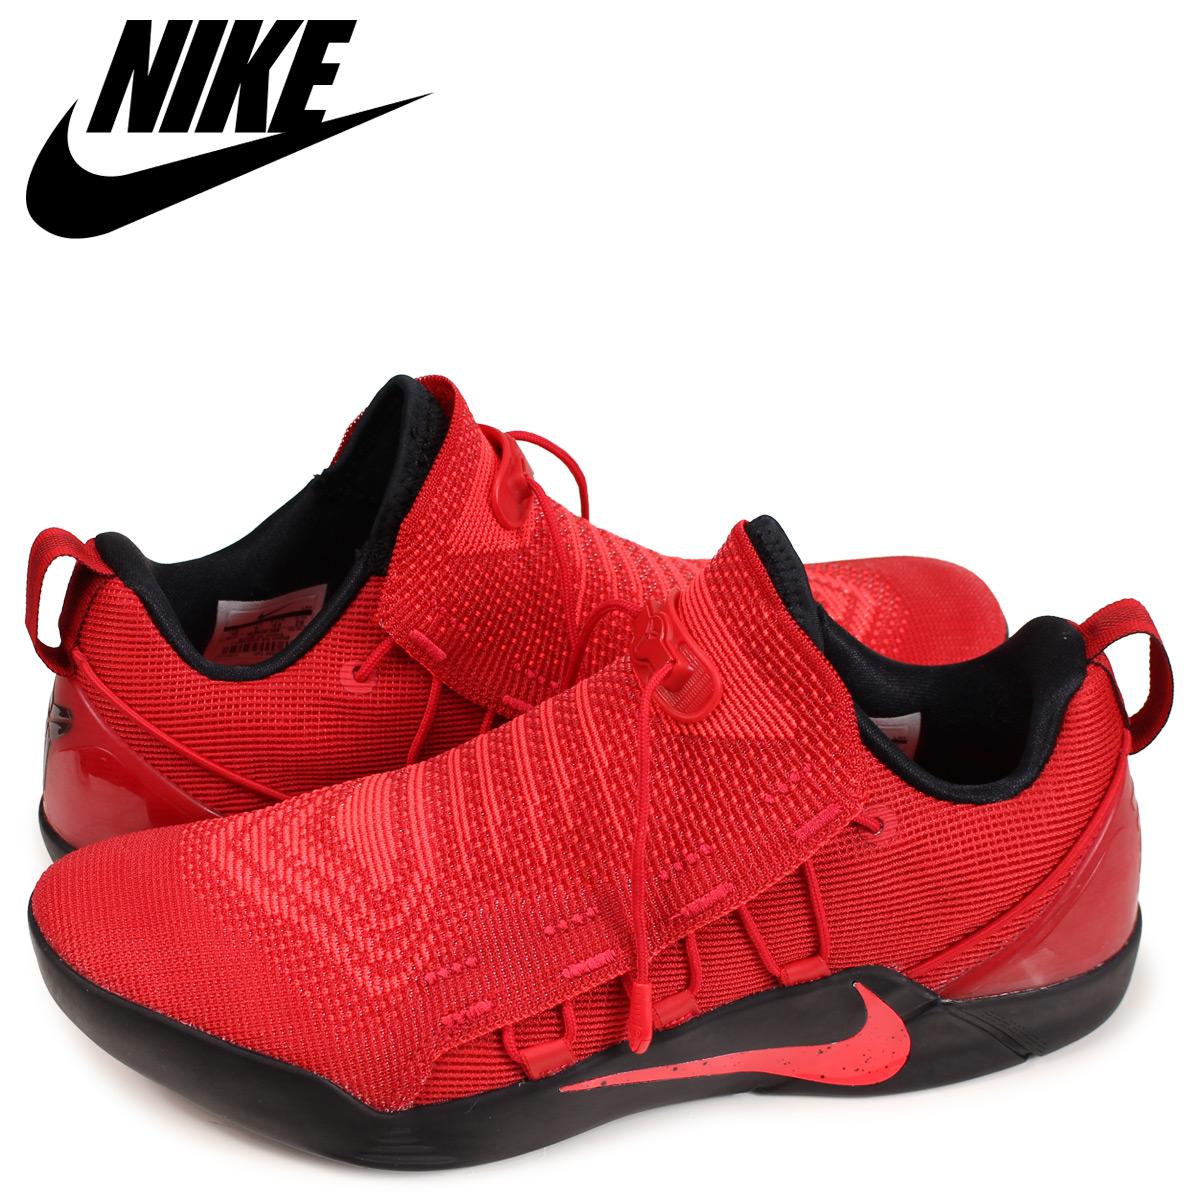 super jakość cienie za pół NIKE KOBE A.D.NXT Nike Corby A.D. Sneakers men red 882,049-600